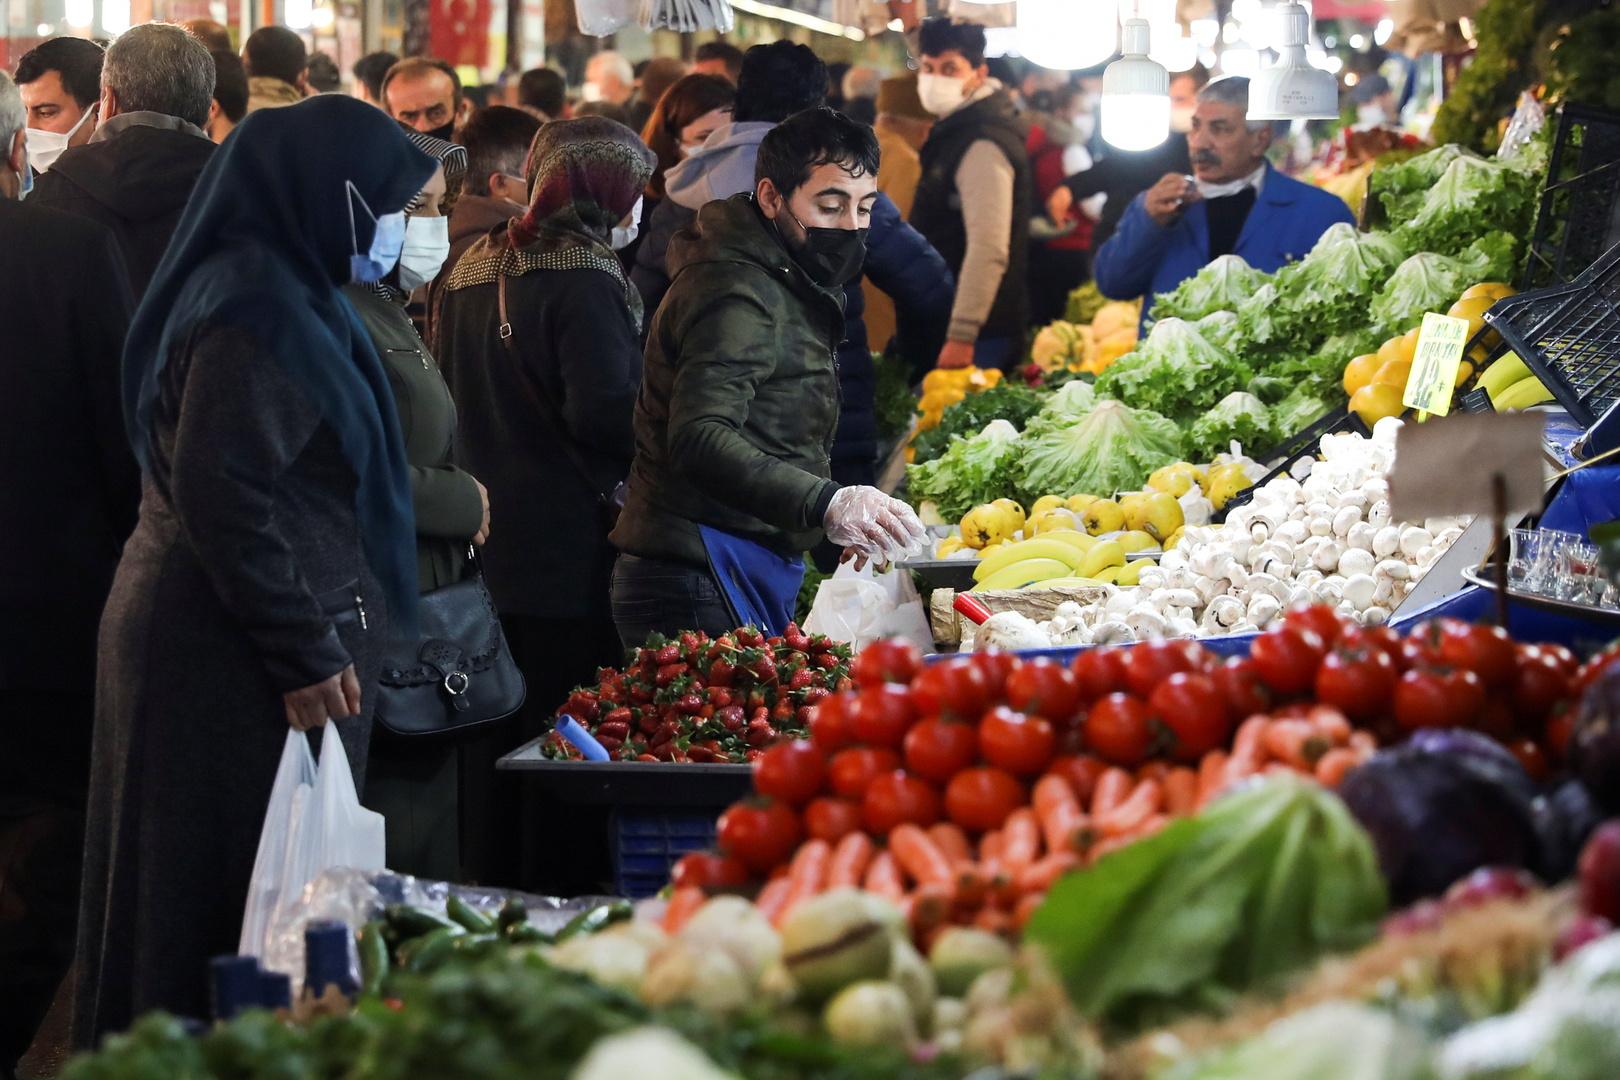 Turkey: 72 deaths and 9,561 new cases of coronavirus